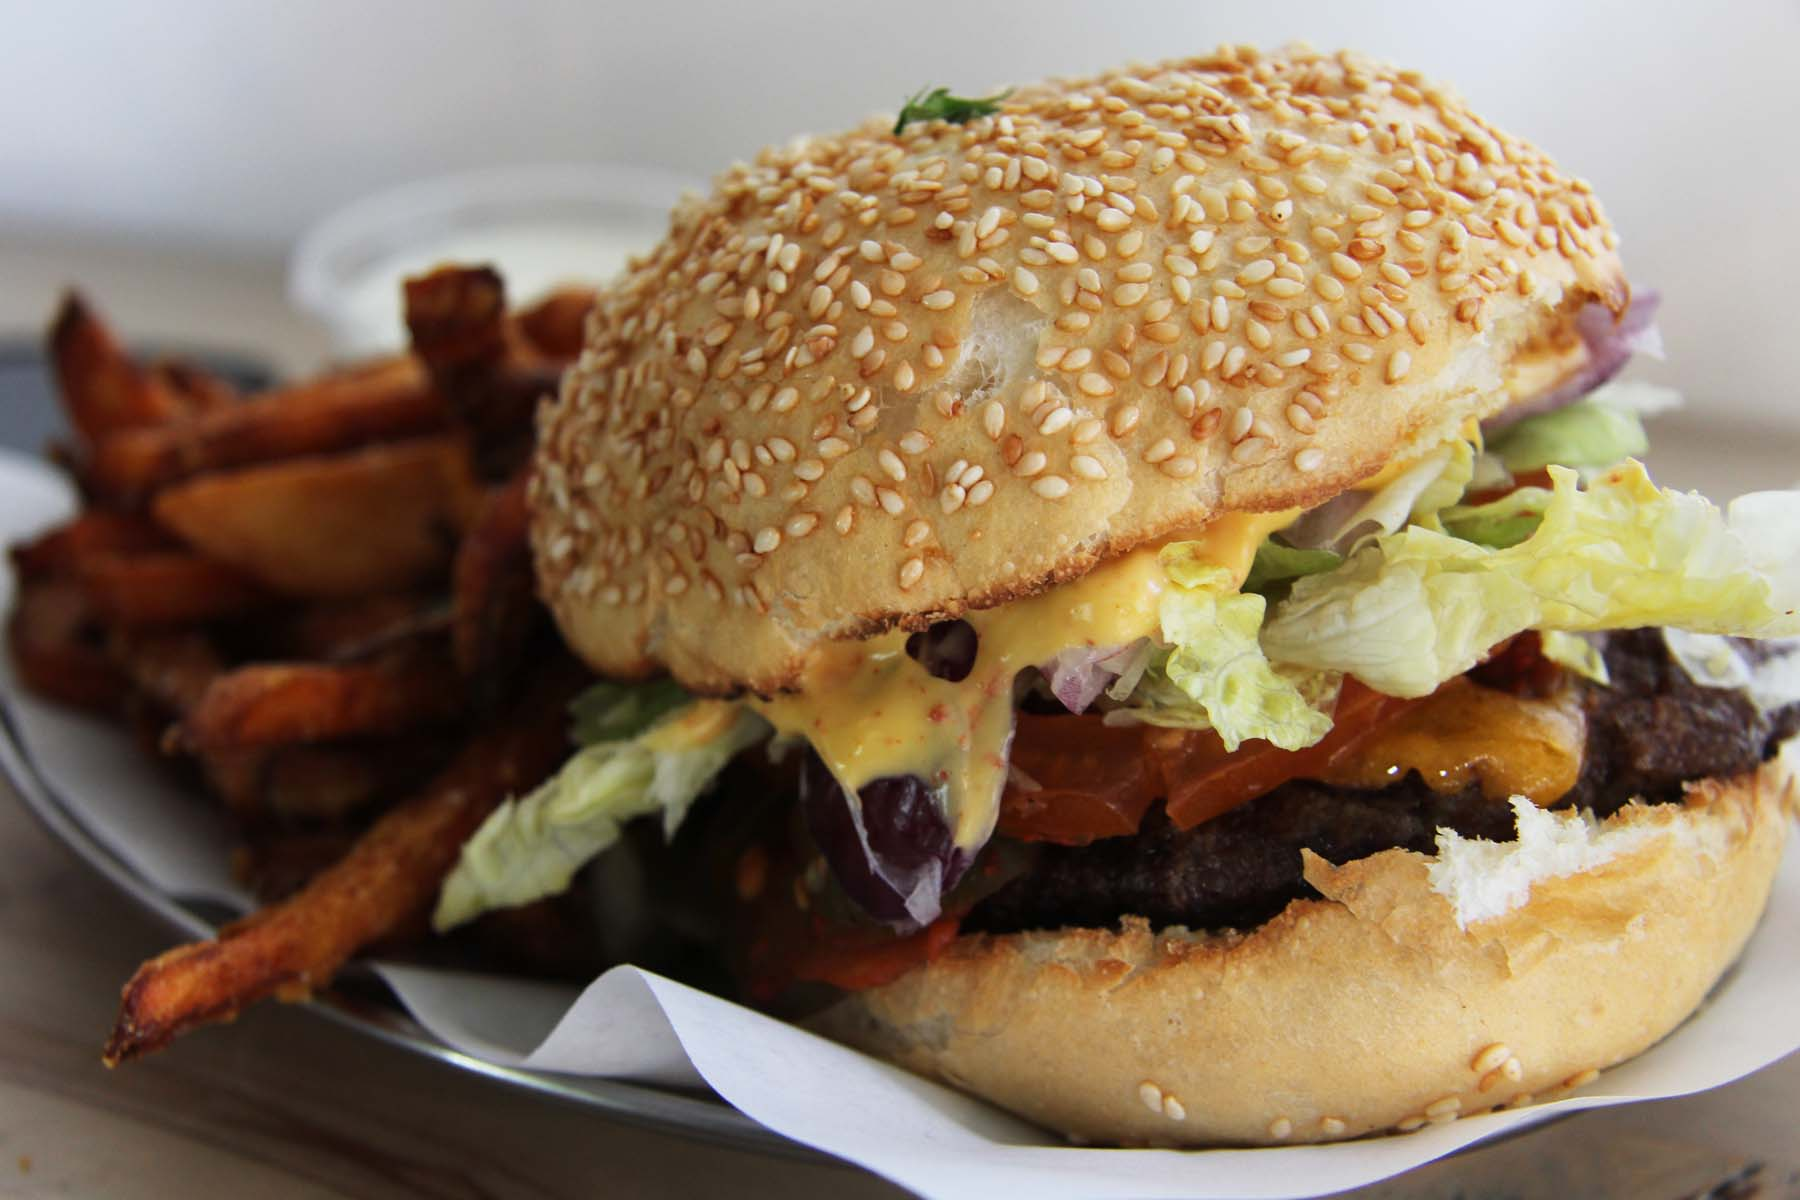 schiller burger berlin andberlin. Black Bedroom Furniture Sets. Home Design Ideas